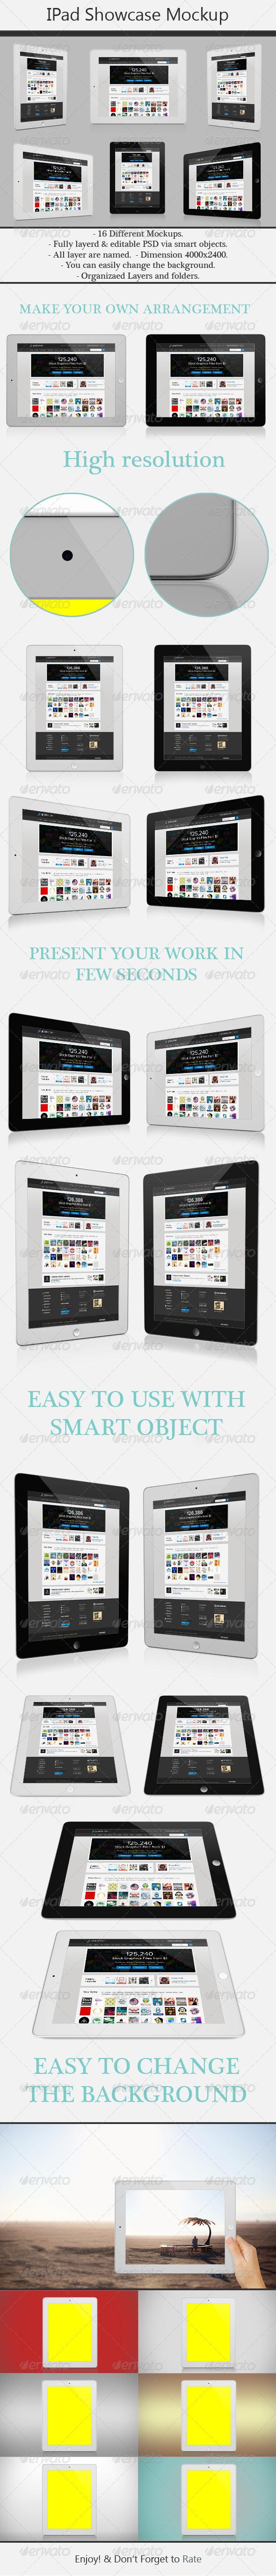 GraphicRiver Responsive Tablet Mockup 5013895